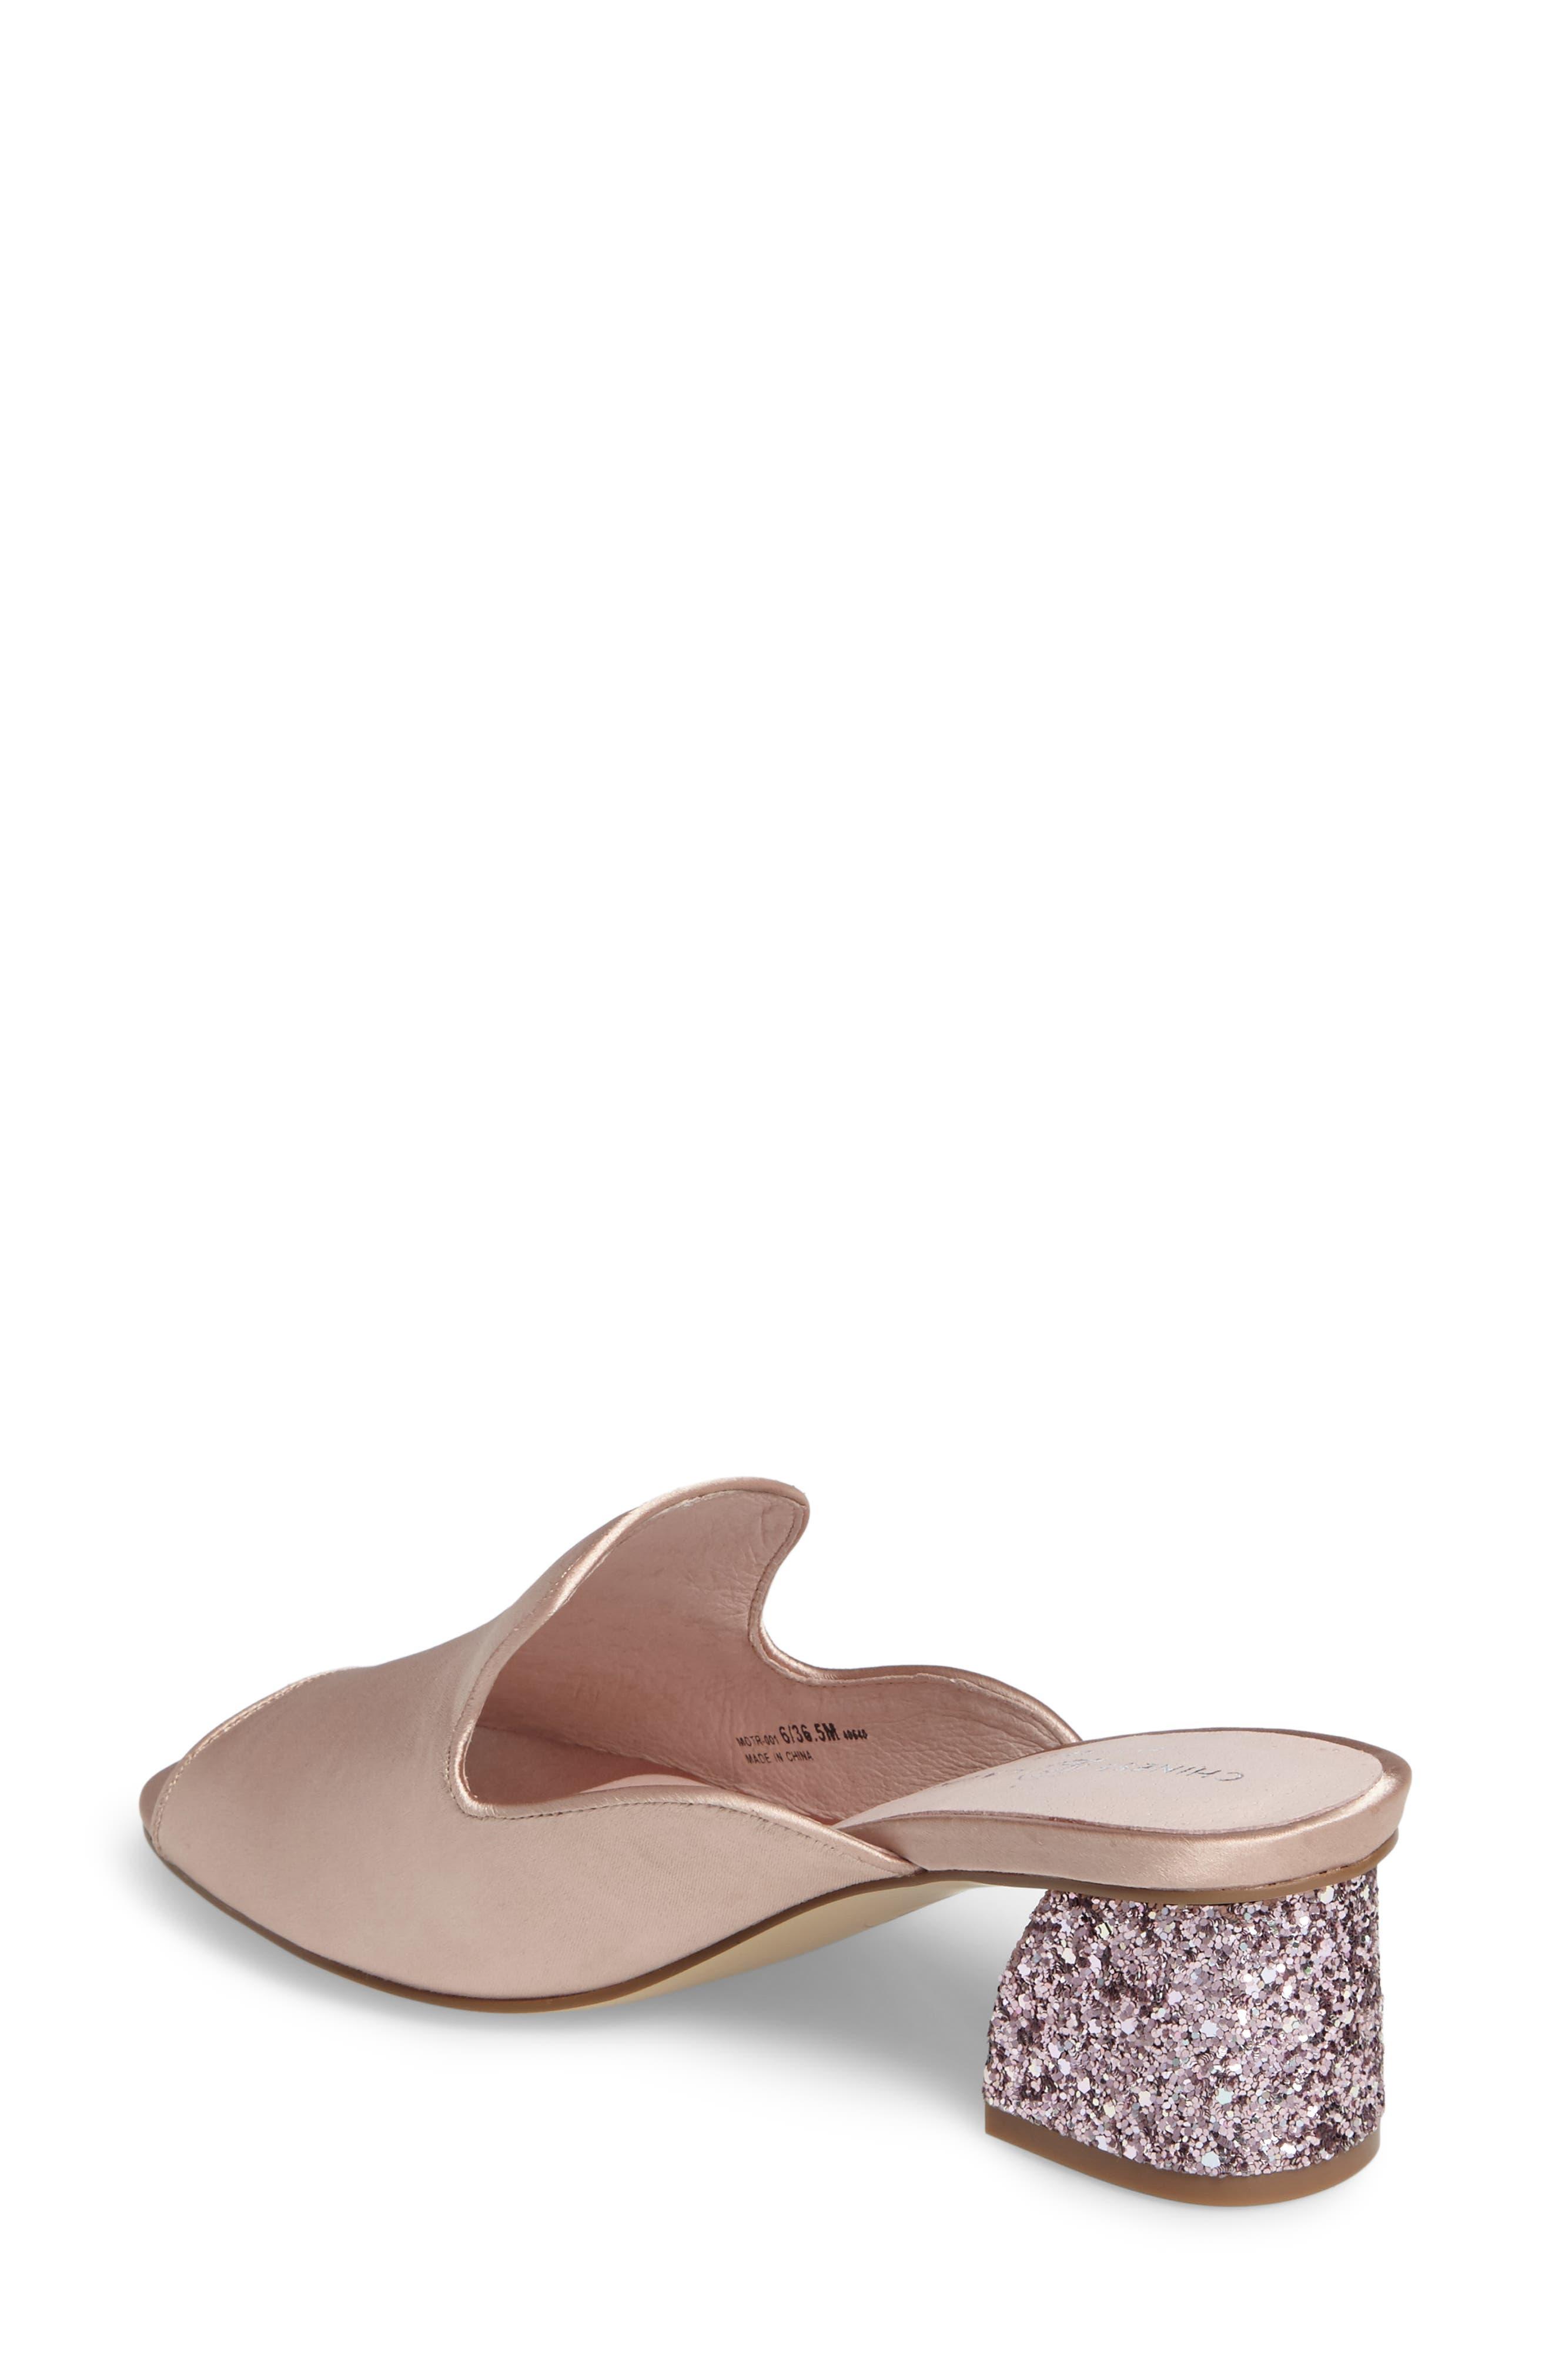 Mara Glitter Loafer Mule,                             Alternate thumbnail 2, color,                             Summer Nude Satin